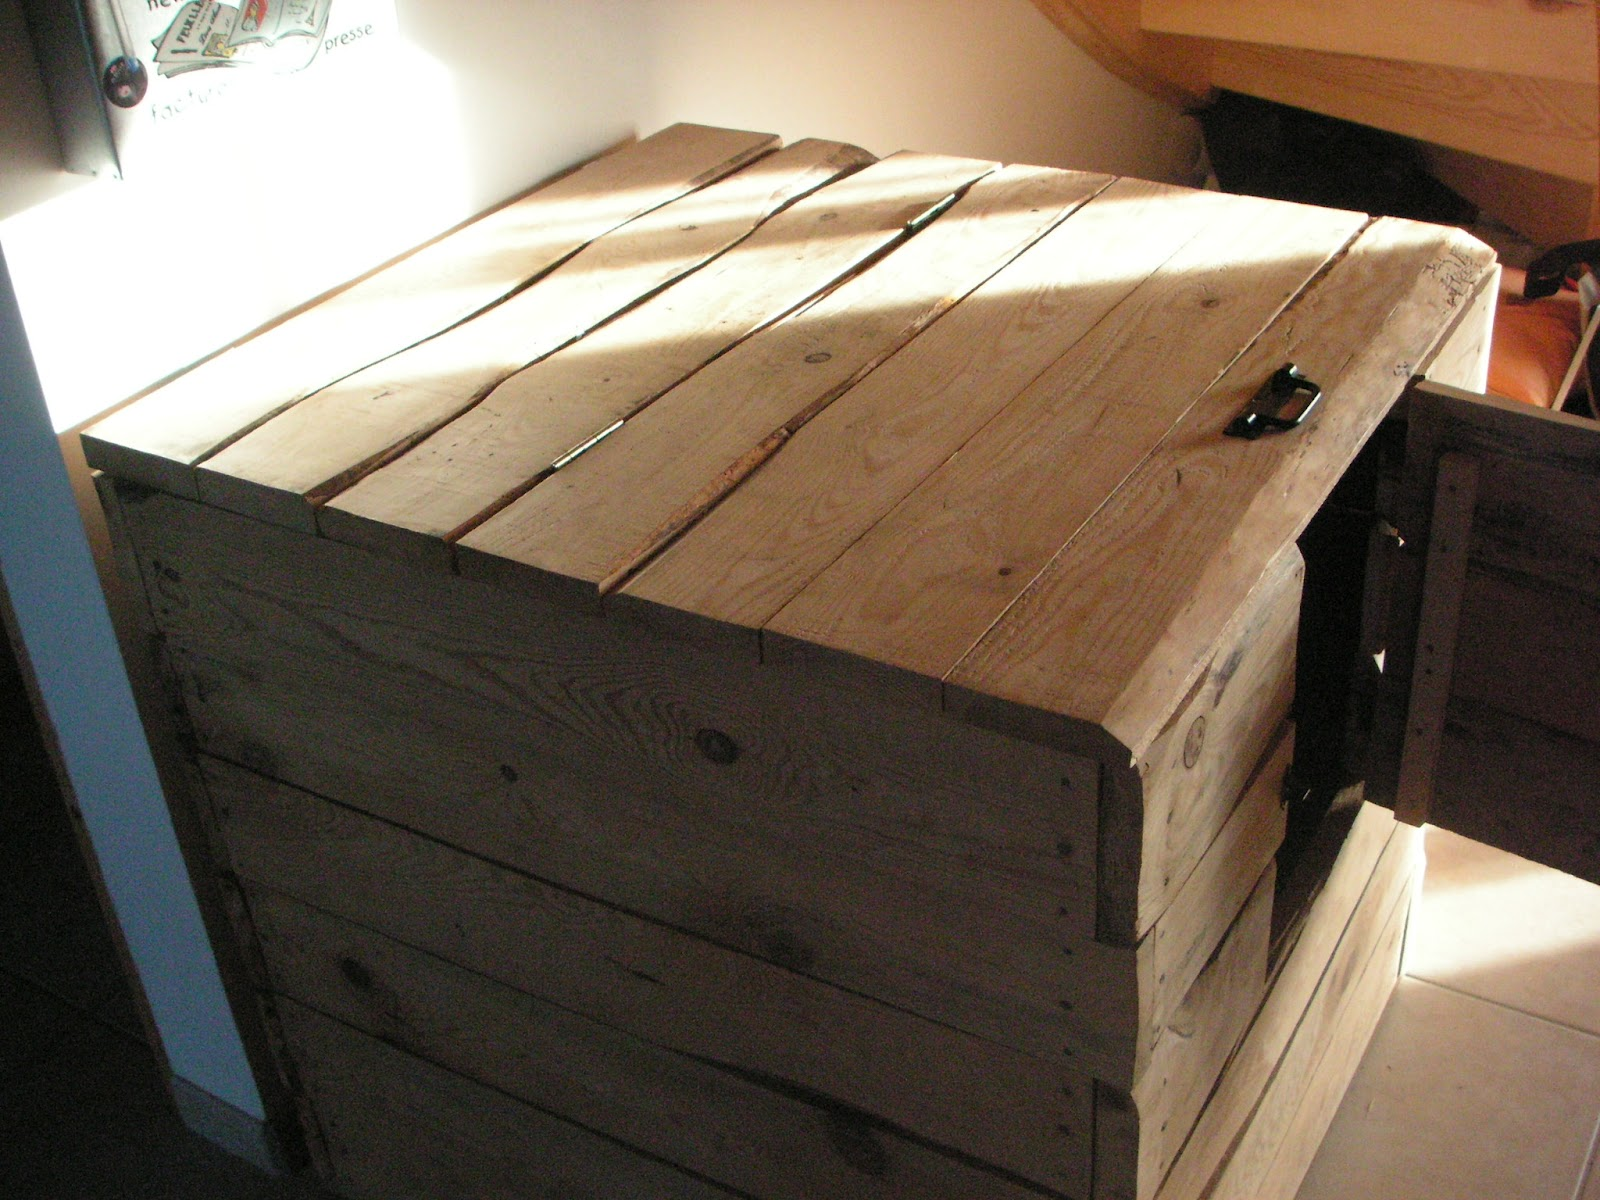 construire retaper juillet 2012. Black Bedroom Furniture Sets. Home Design Ideas